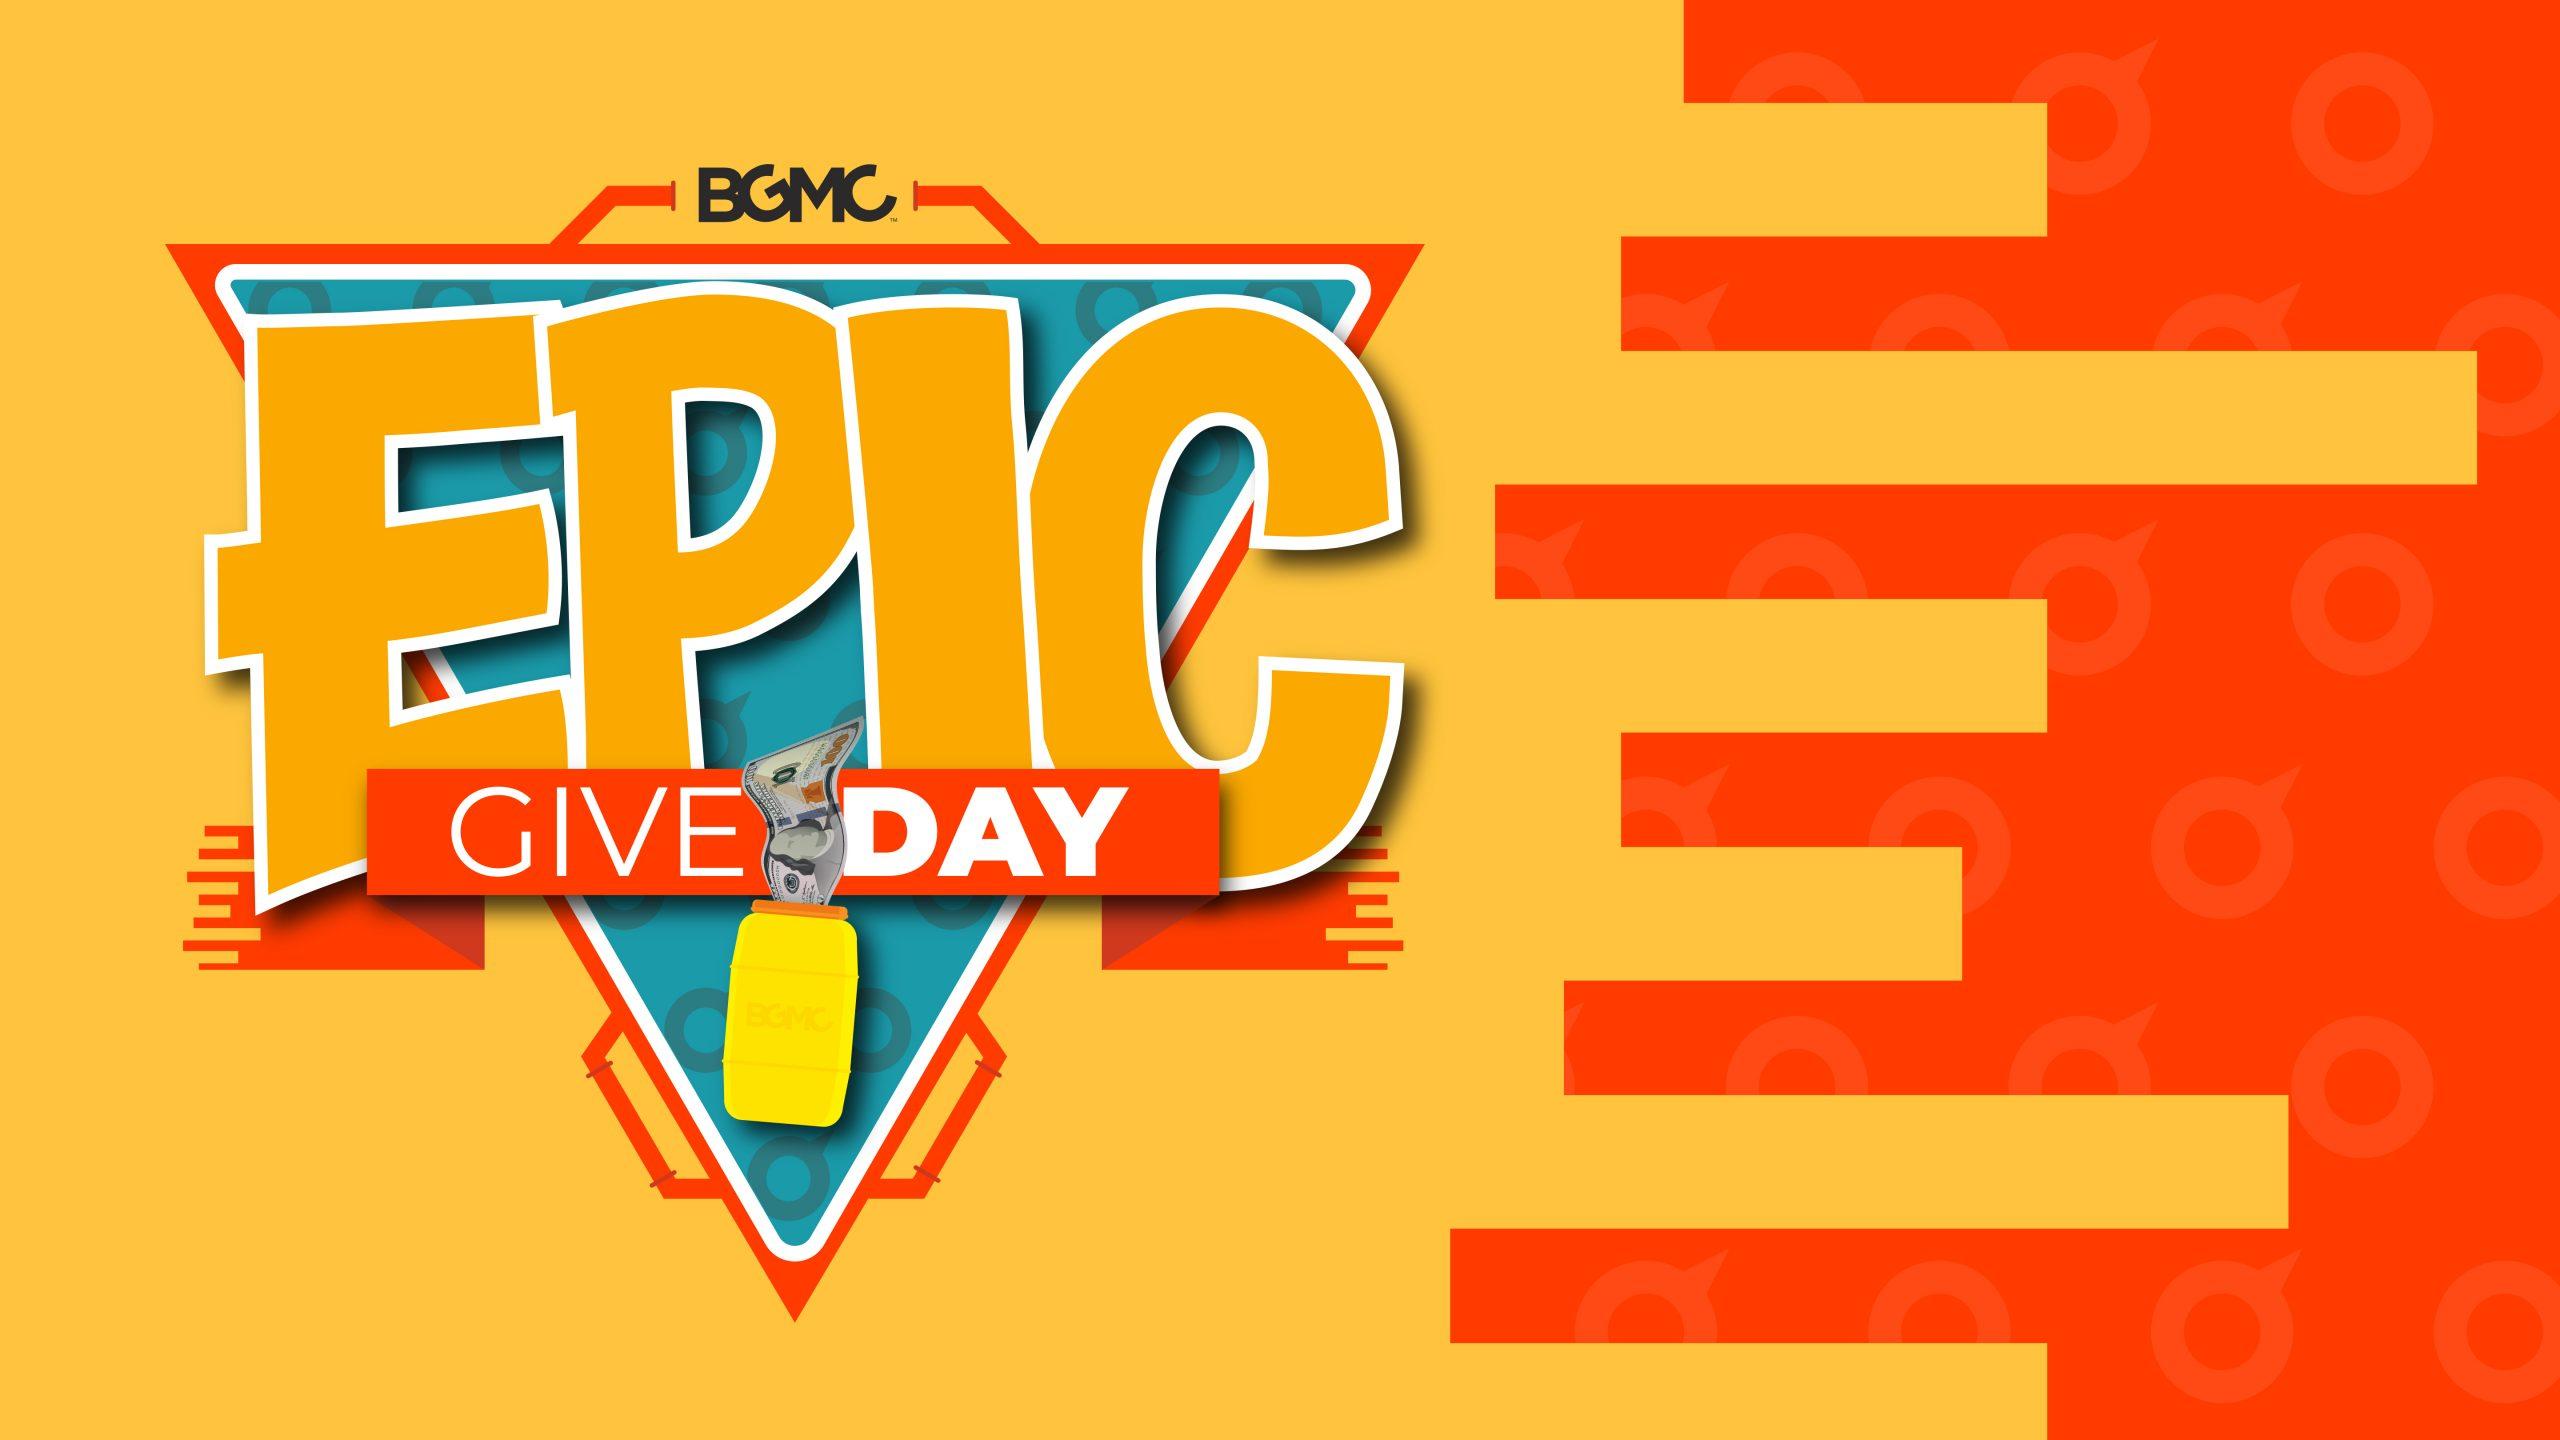 epicgiveday